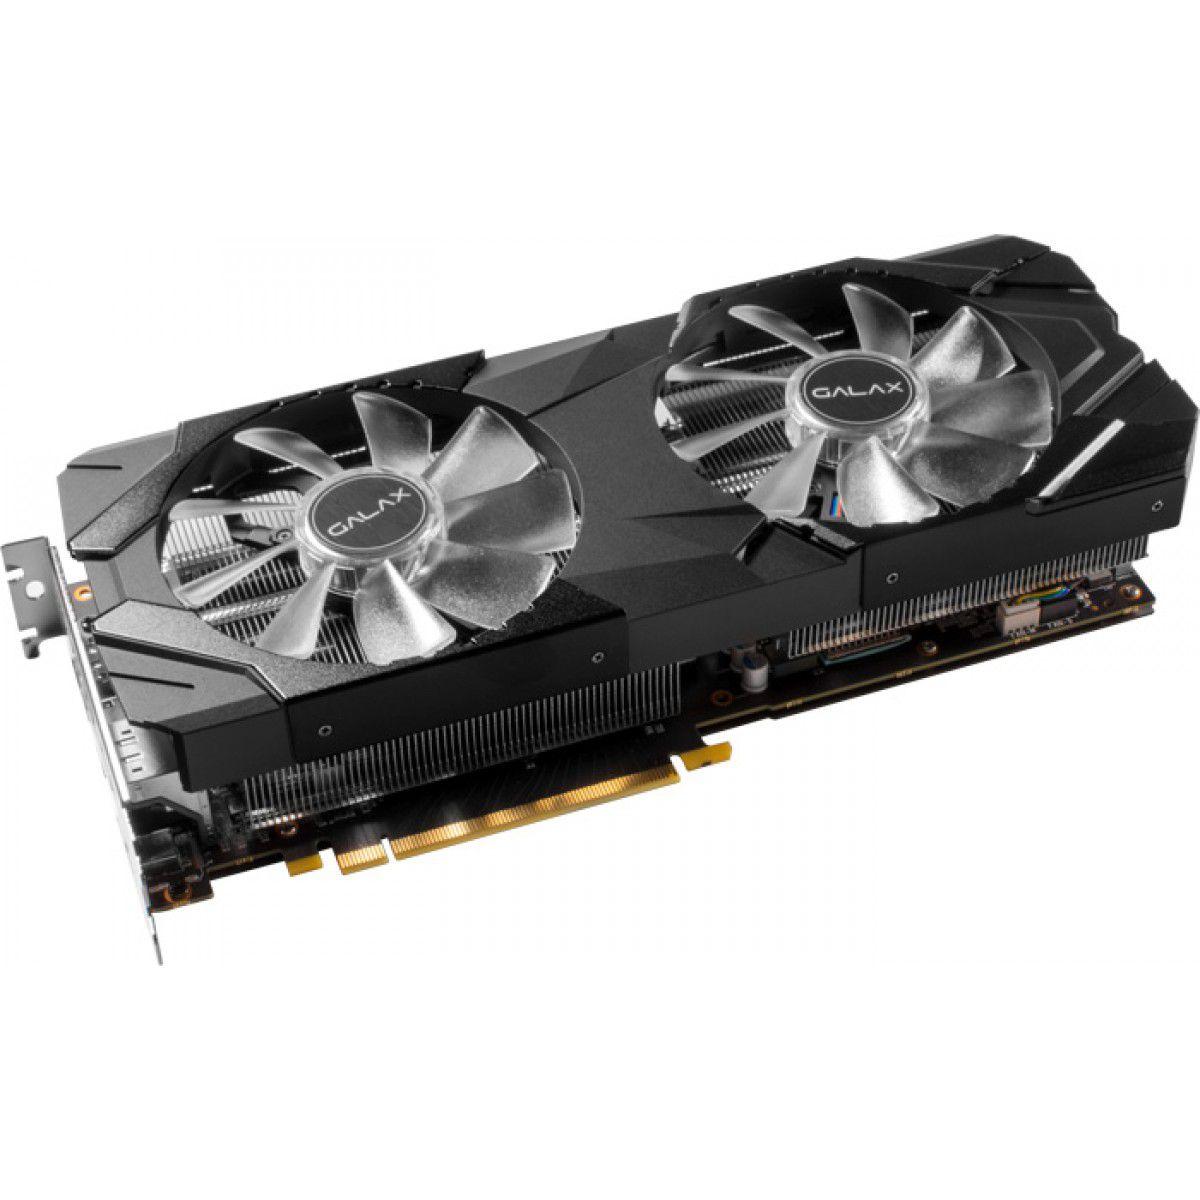 Placa de Video Galax Geforce RTX 2070 Super EX 1 CLICK OC 8GB DDR6 - 256BITS - 27ISL6MDU9EX